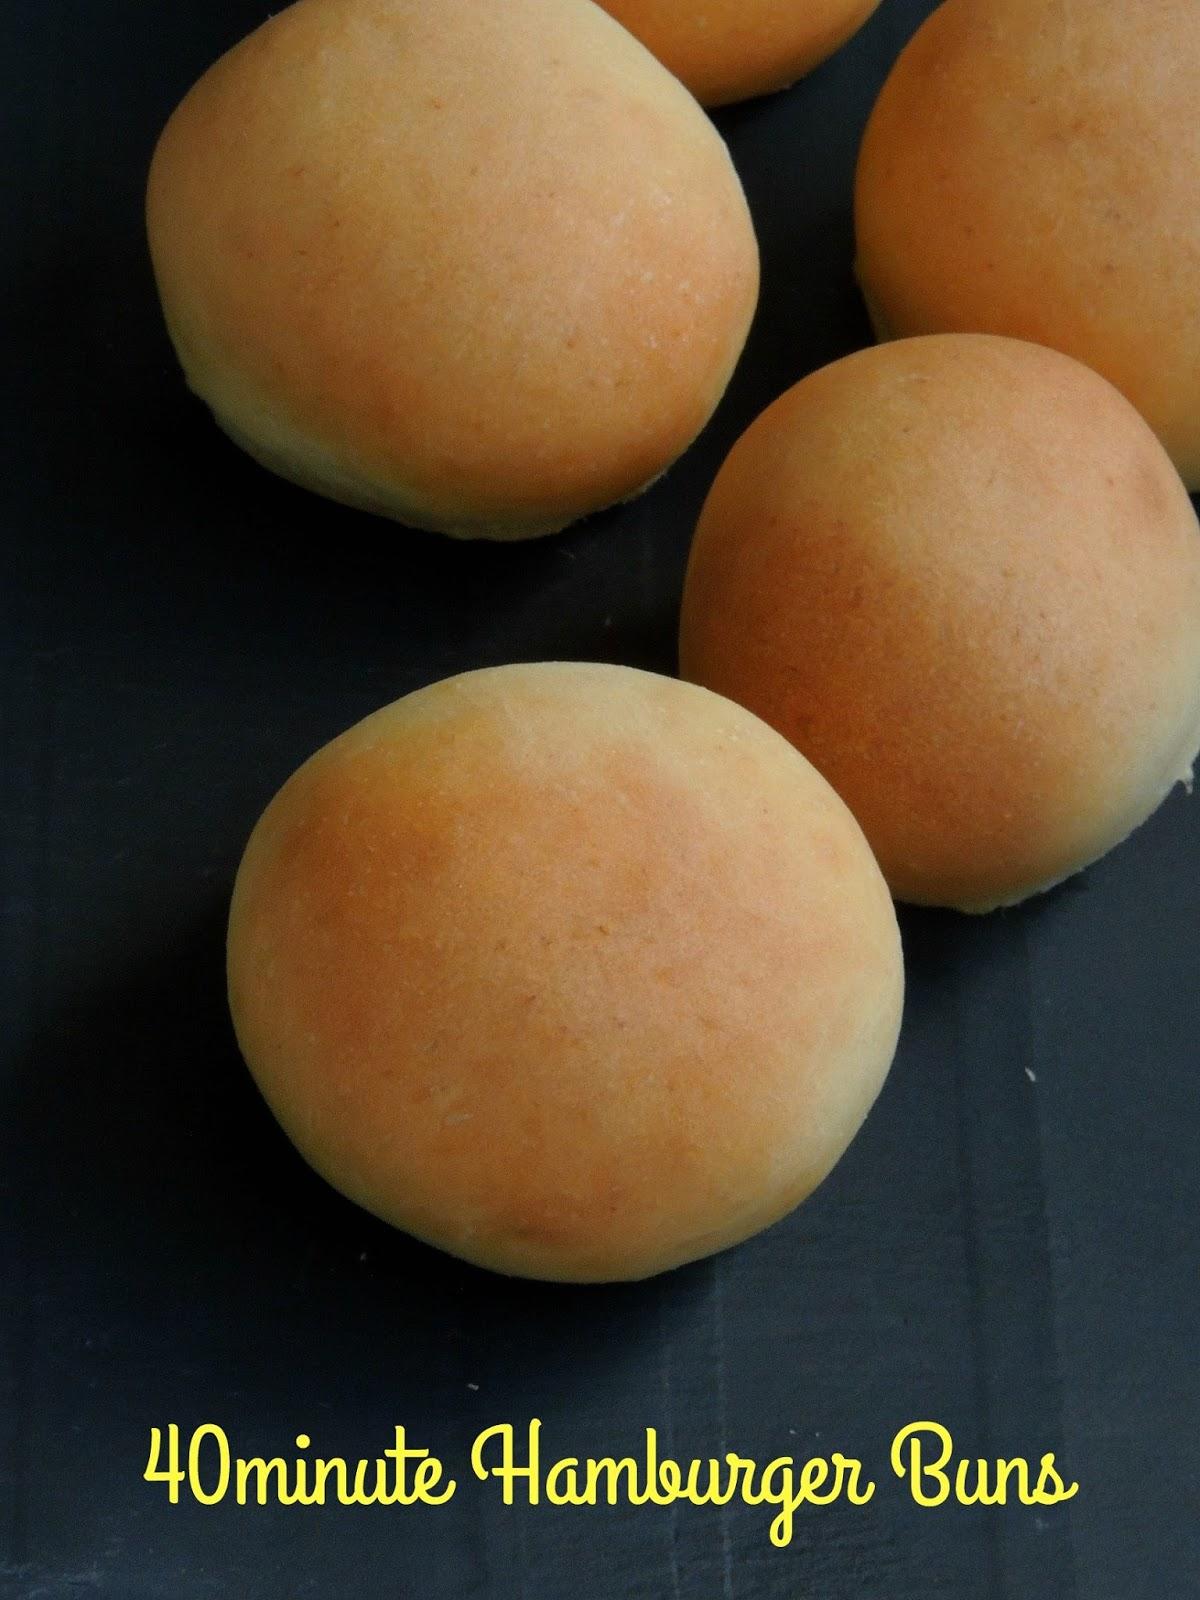 Priya's Versatile Recipes: 40minute Eggless Hamburger Buns